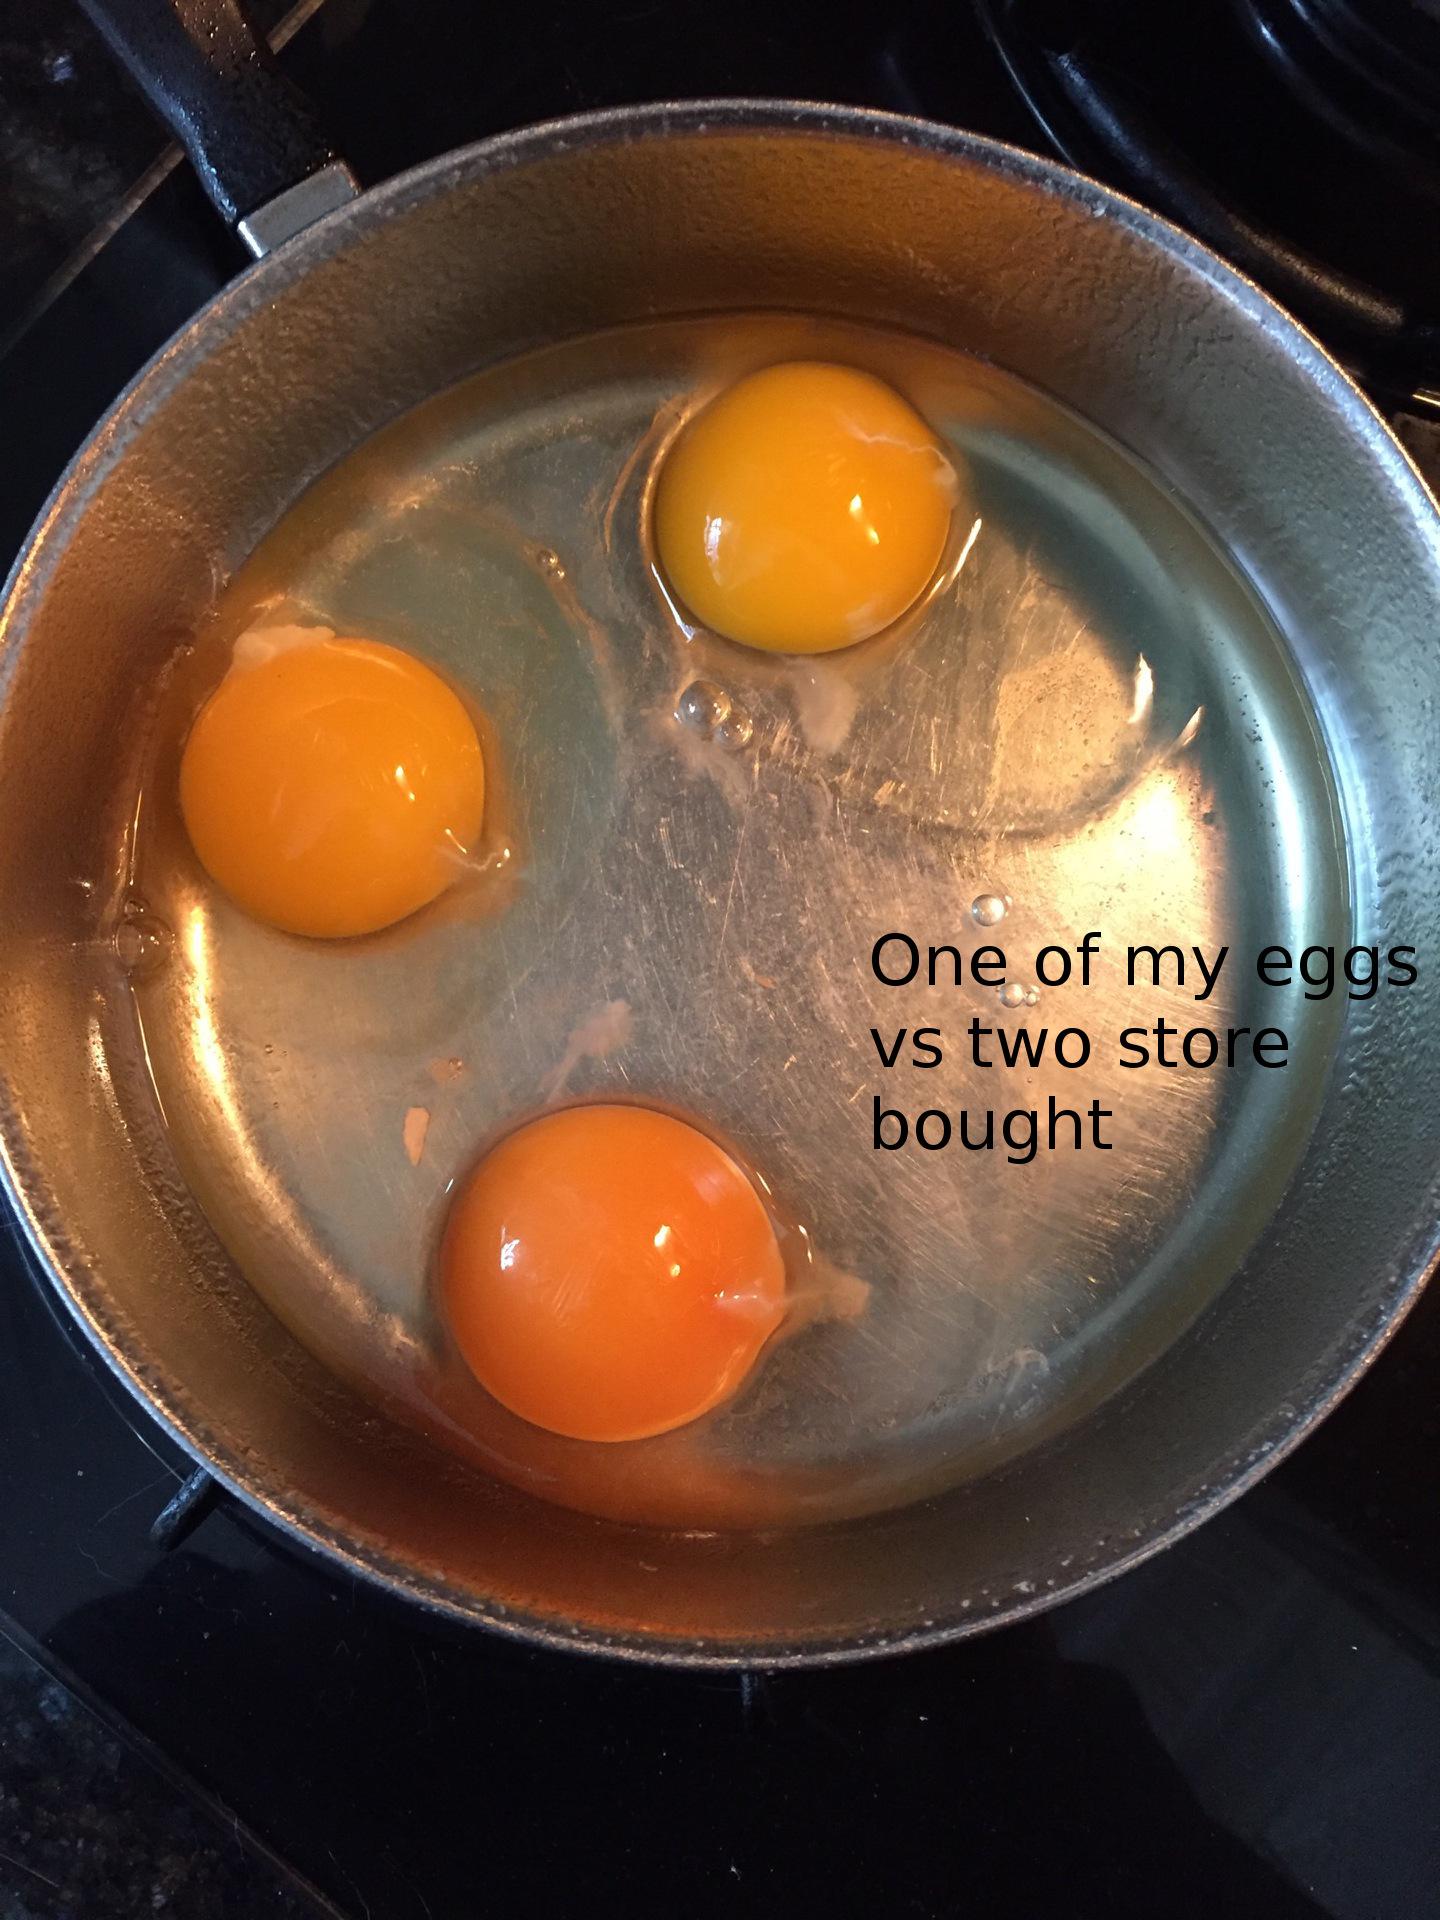 Store bought vs my egg